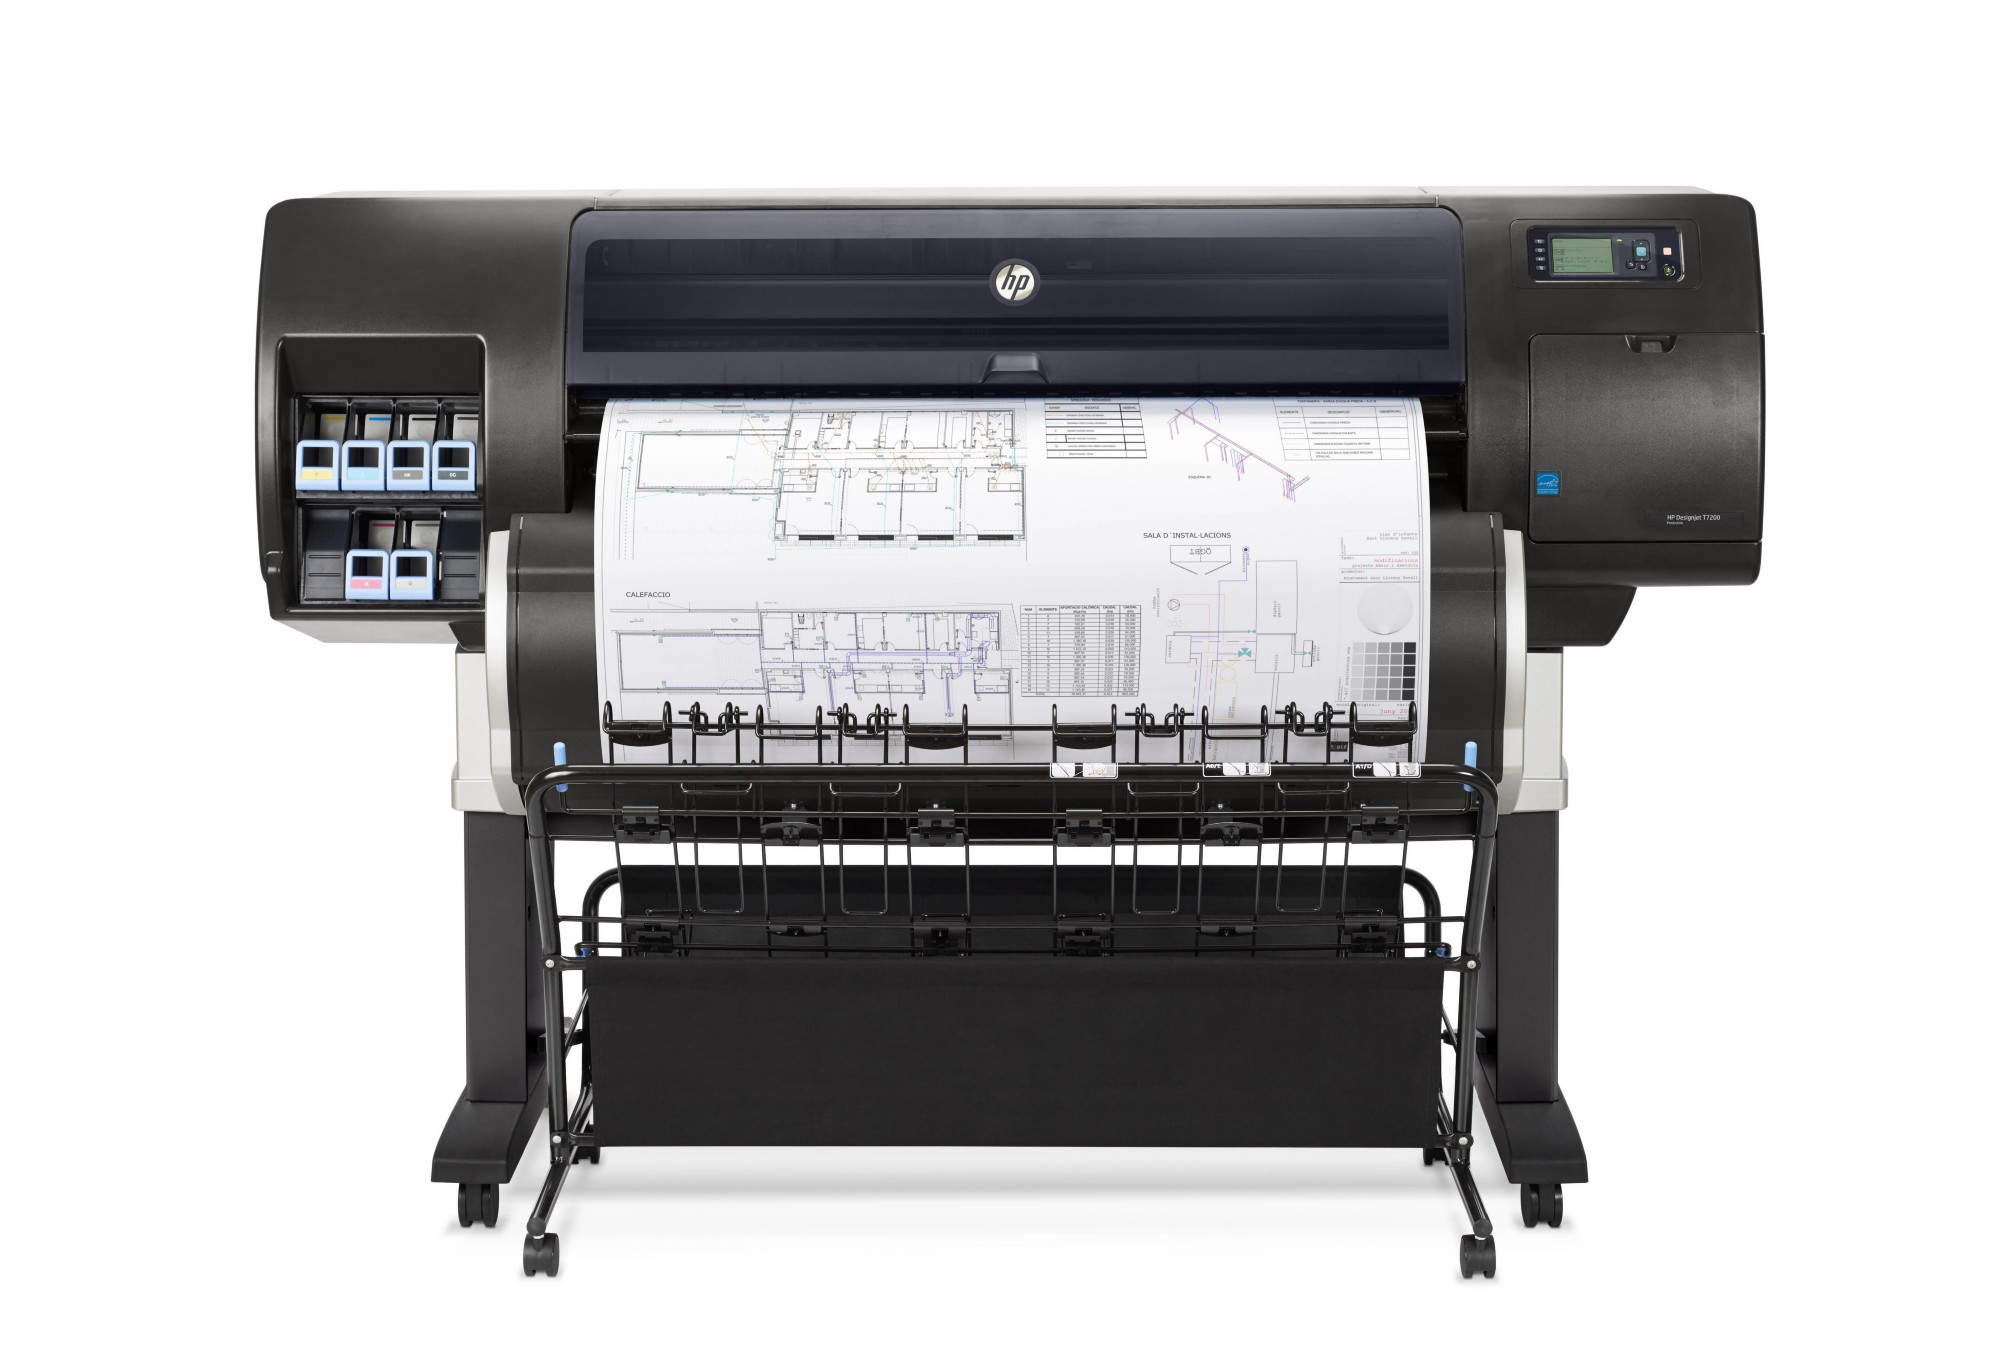 HP Designjet T7200 42-in Ethernet LAN Colour 2400 x 1200DPI Dye-sublimation A1 (594 x 841 mm) large